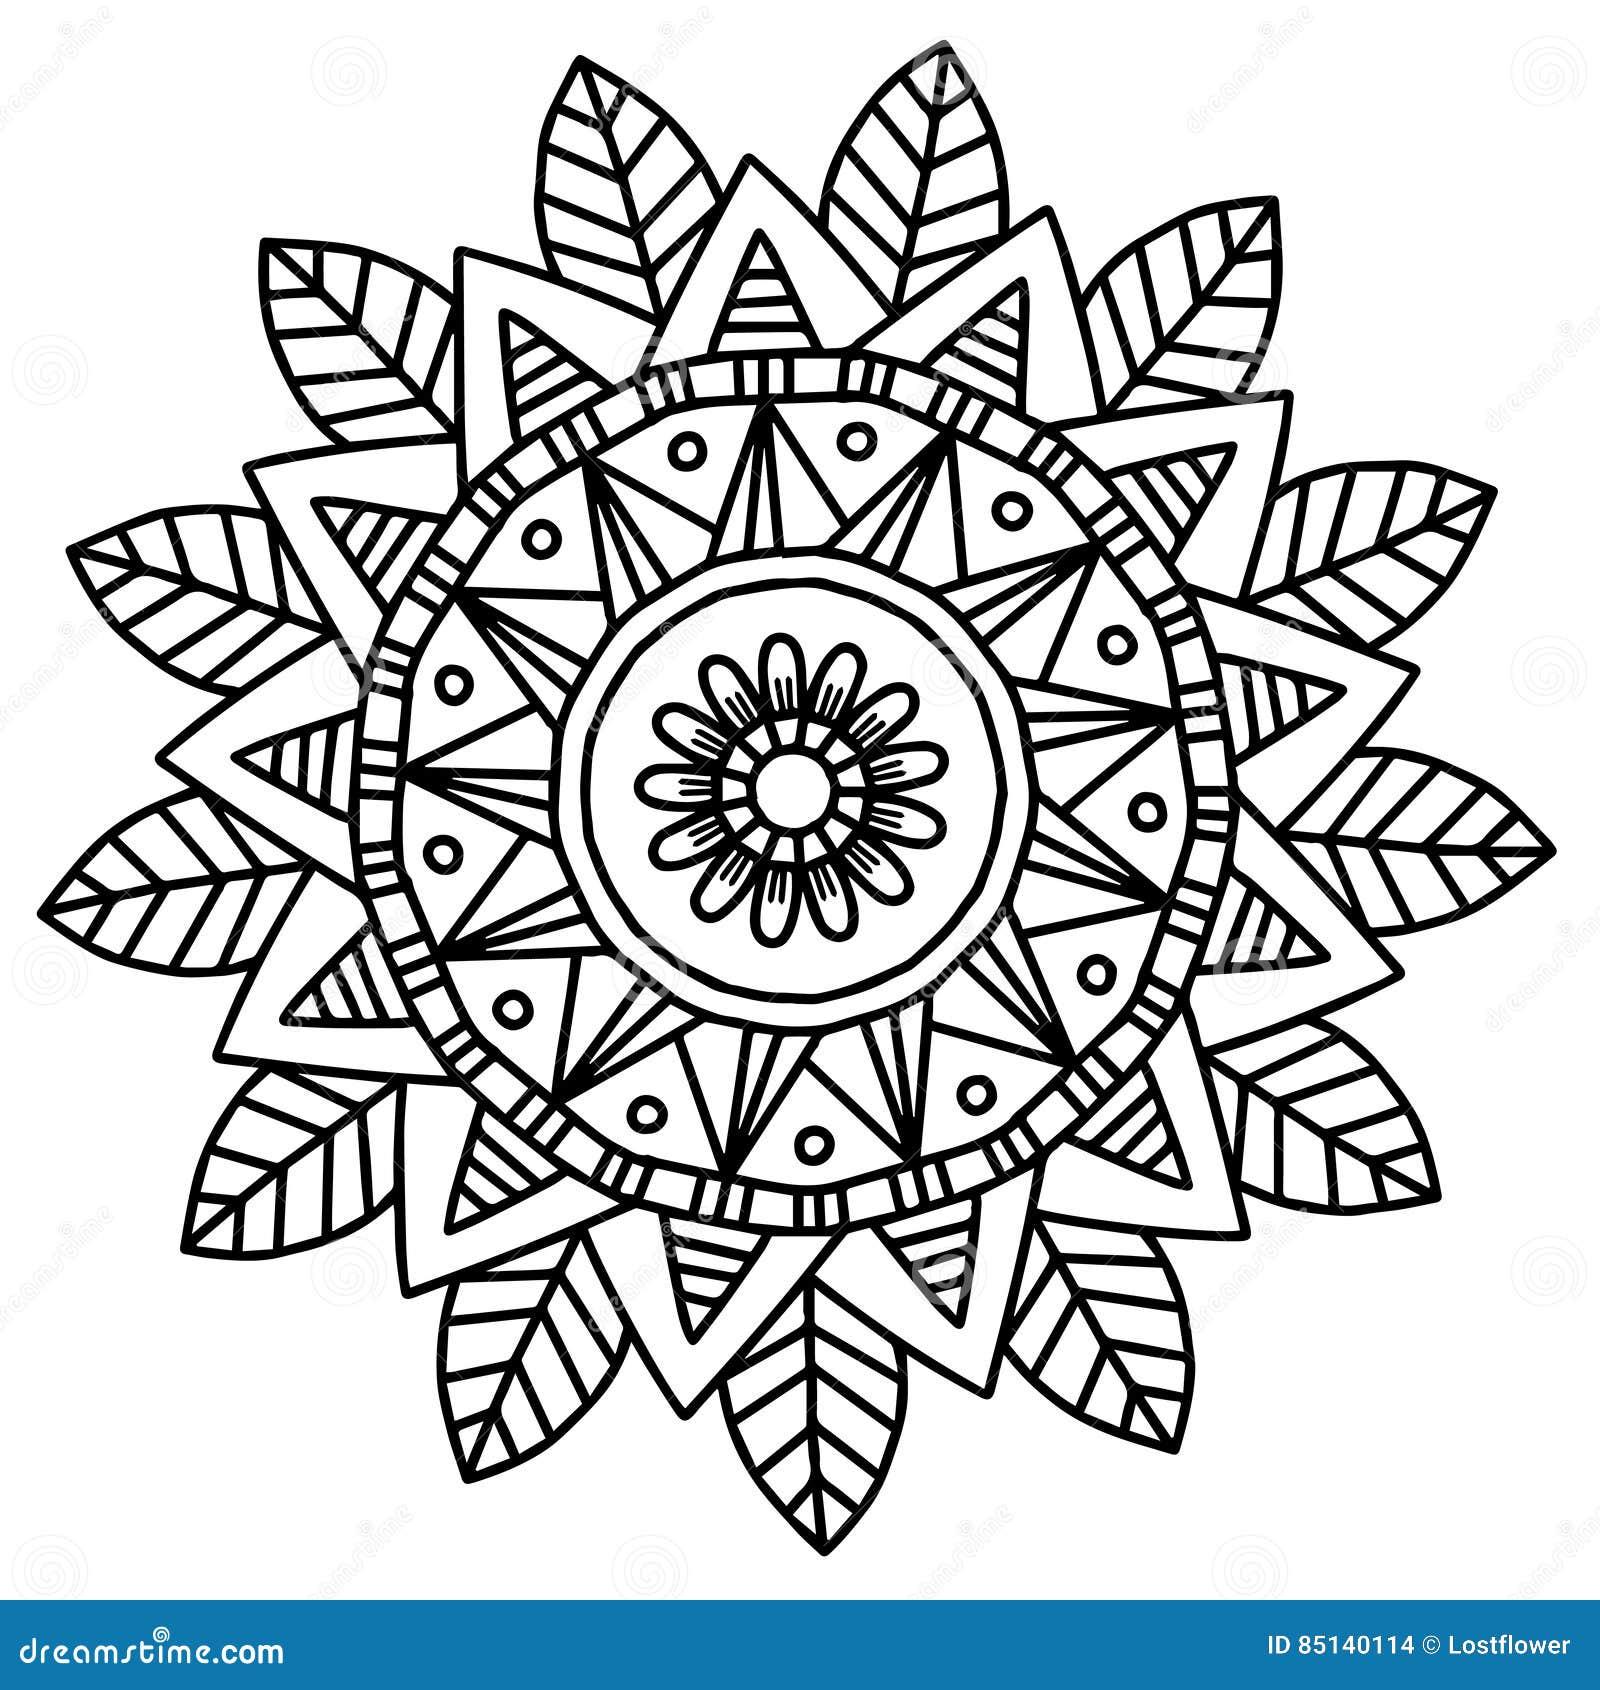 Vector Image For Adult Coloring Book Mandala Doodle Illustration ...